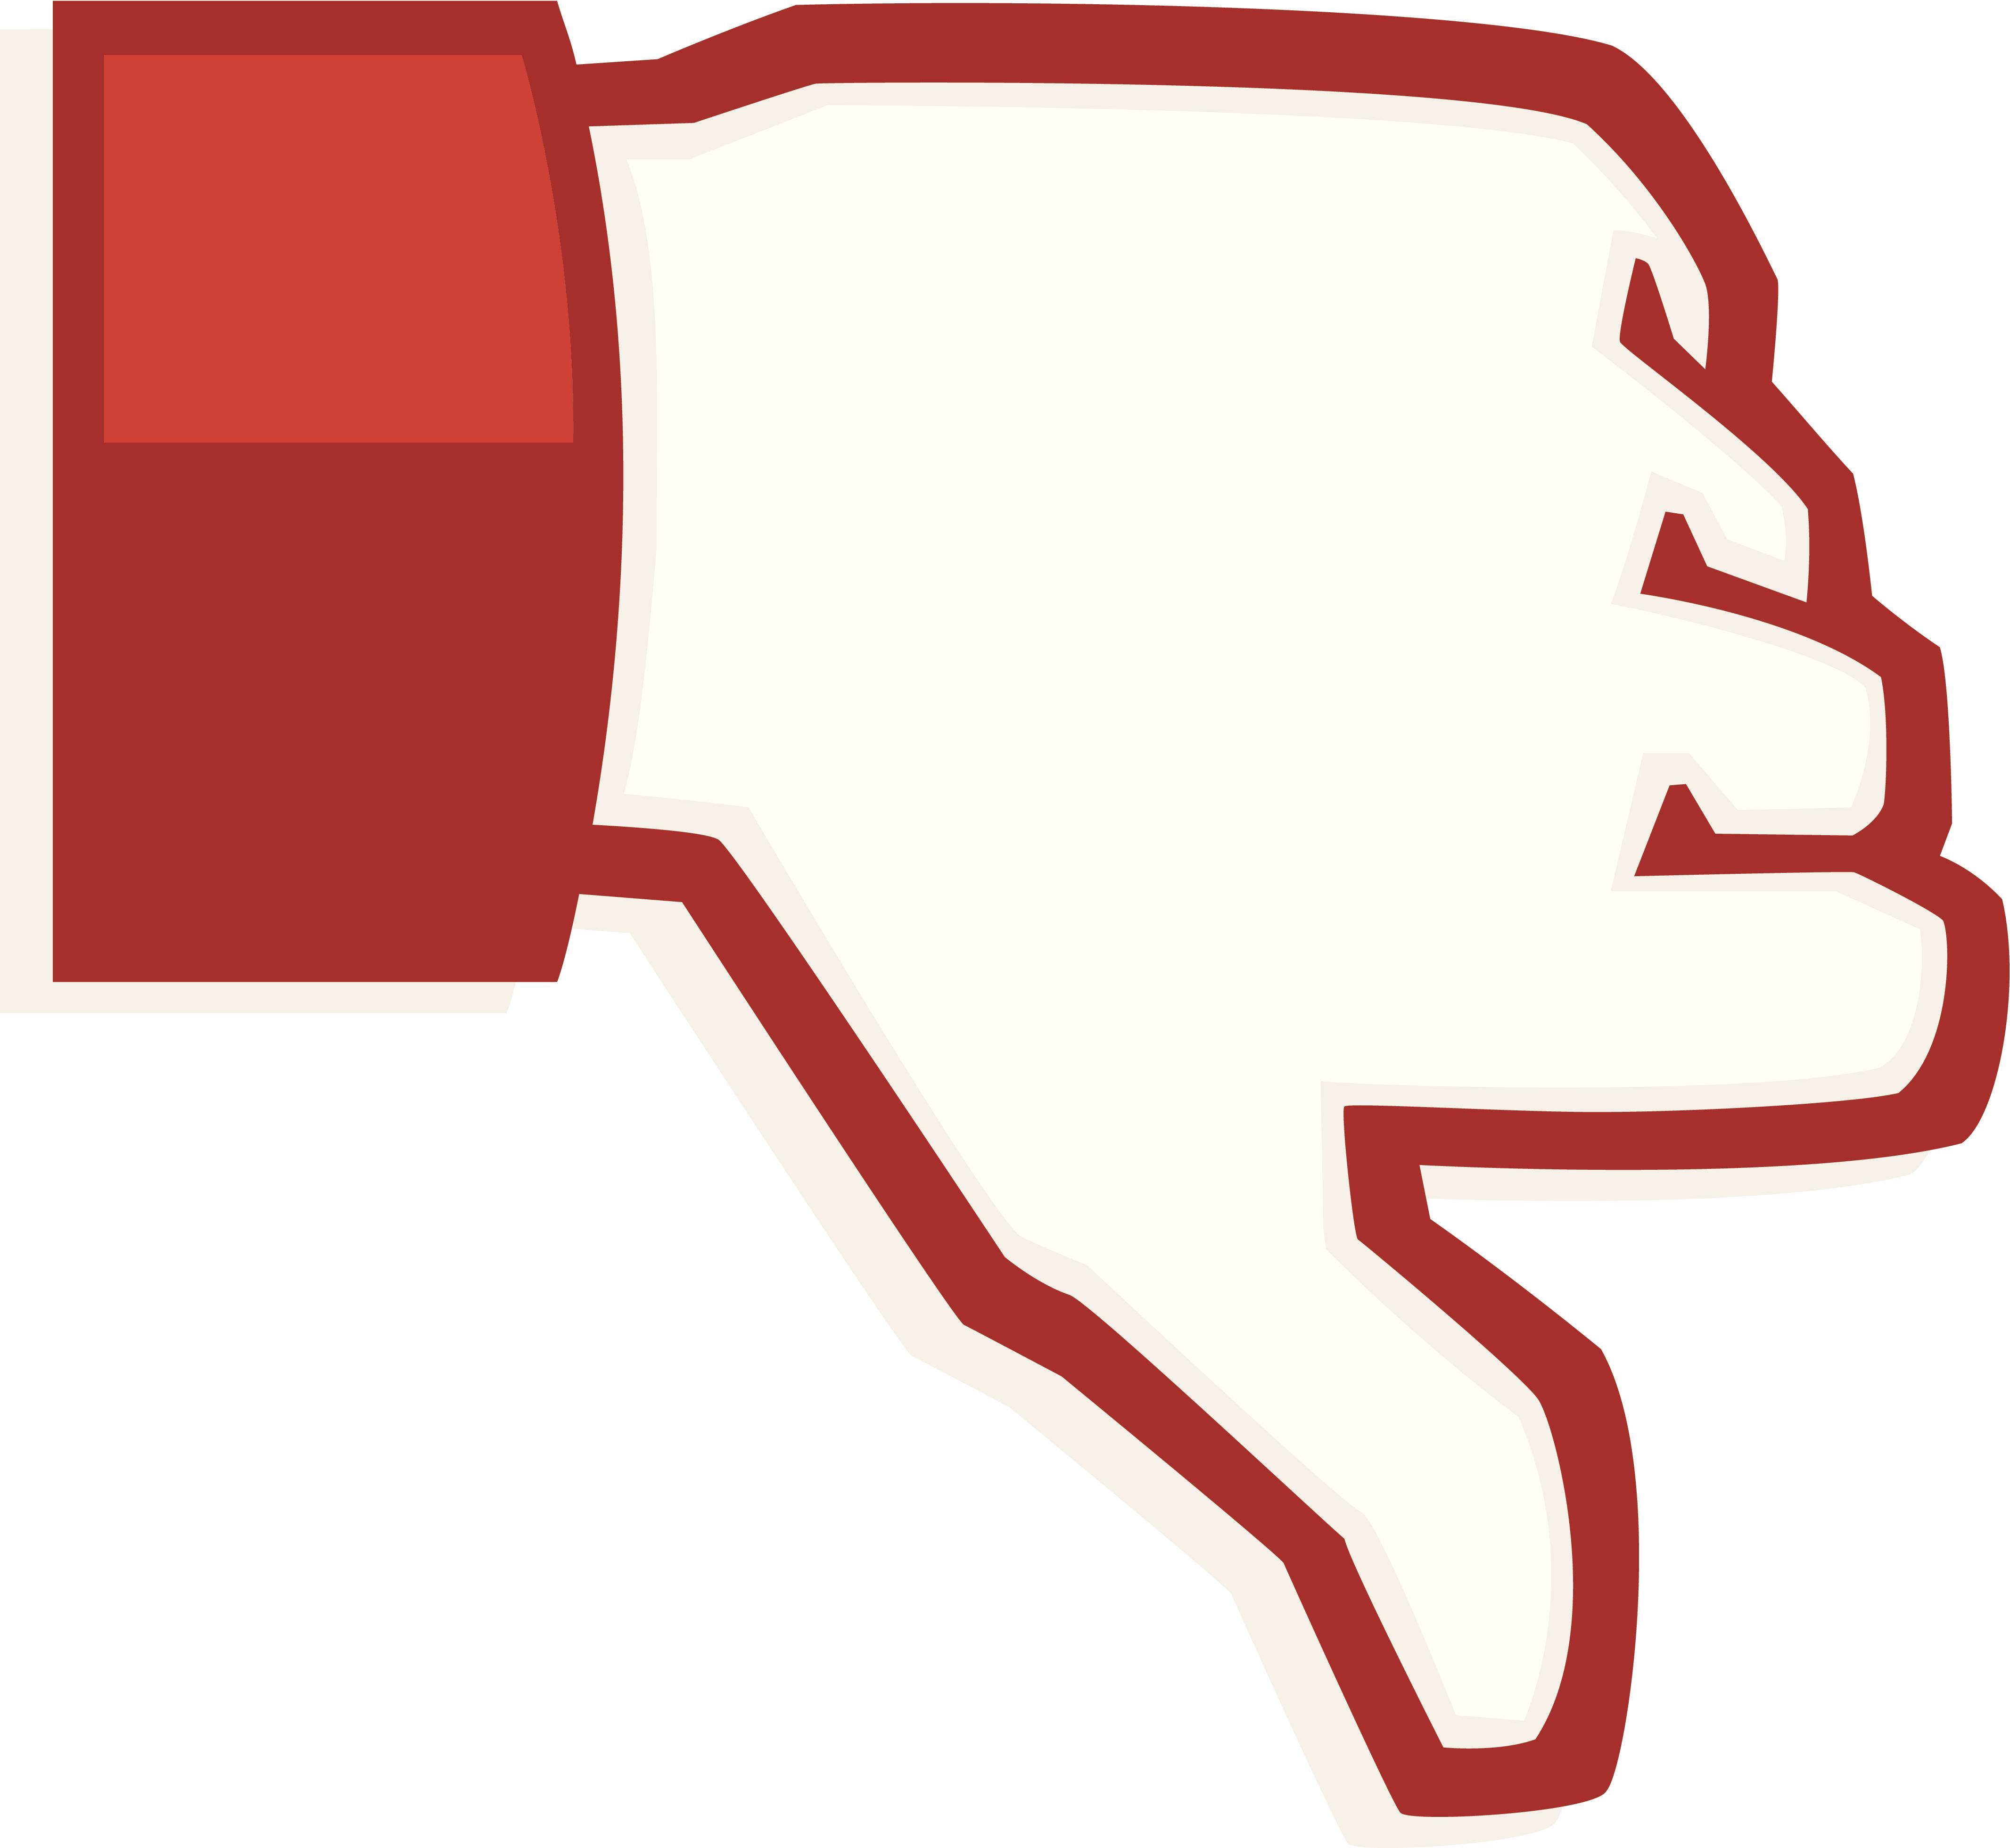 Thumbs Down, not like, dislike, youtube icon #45984.